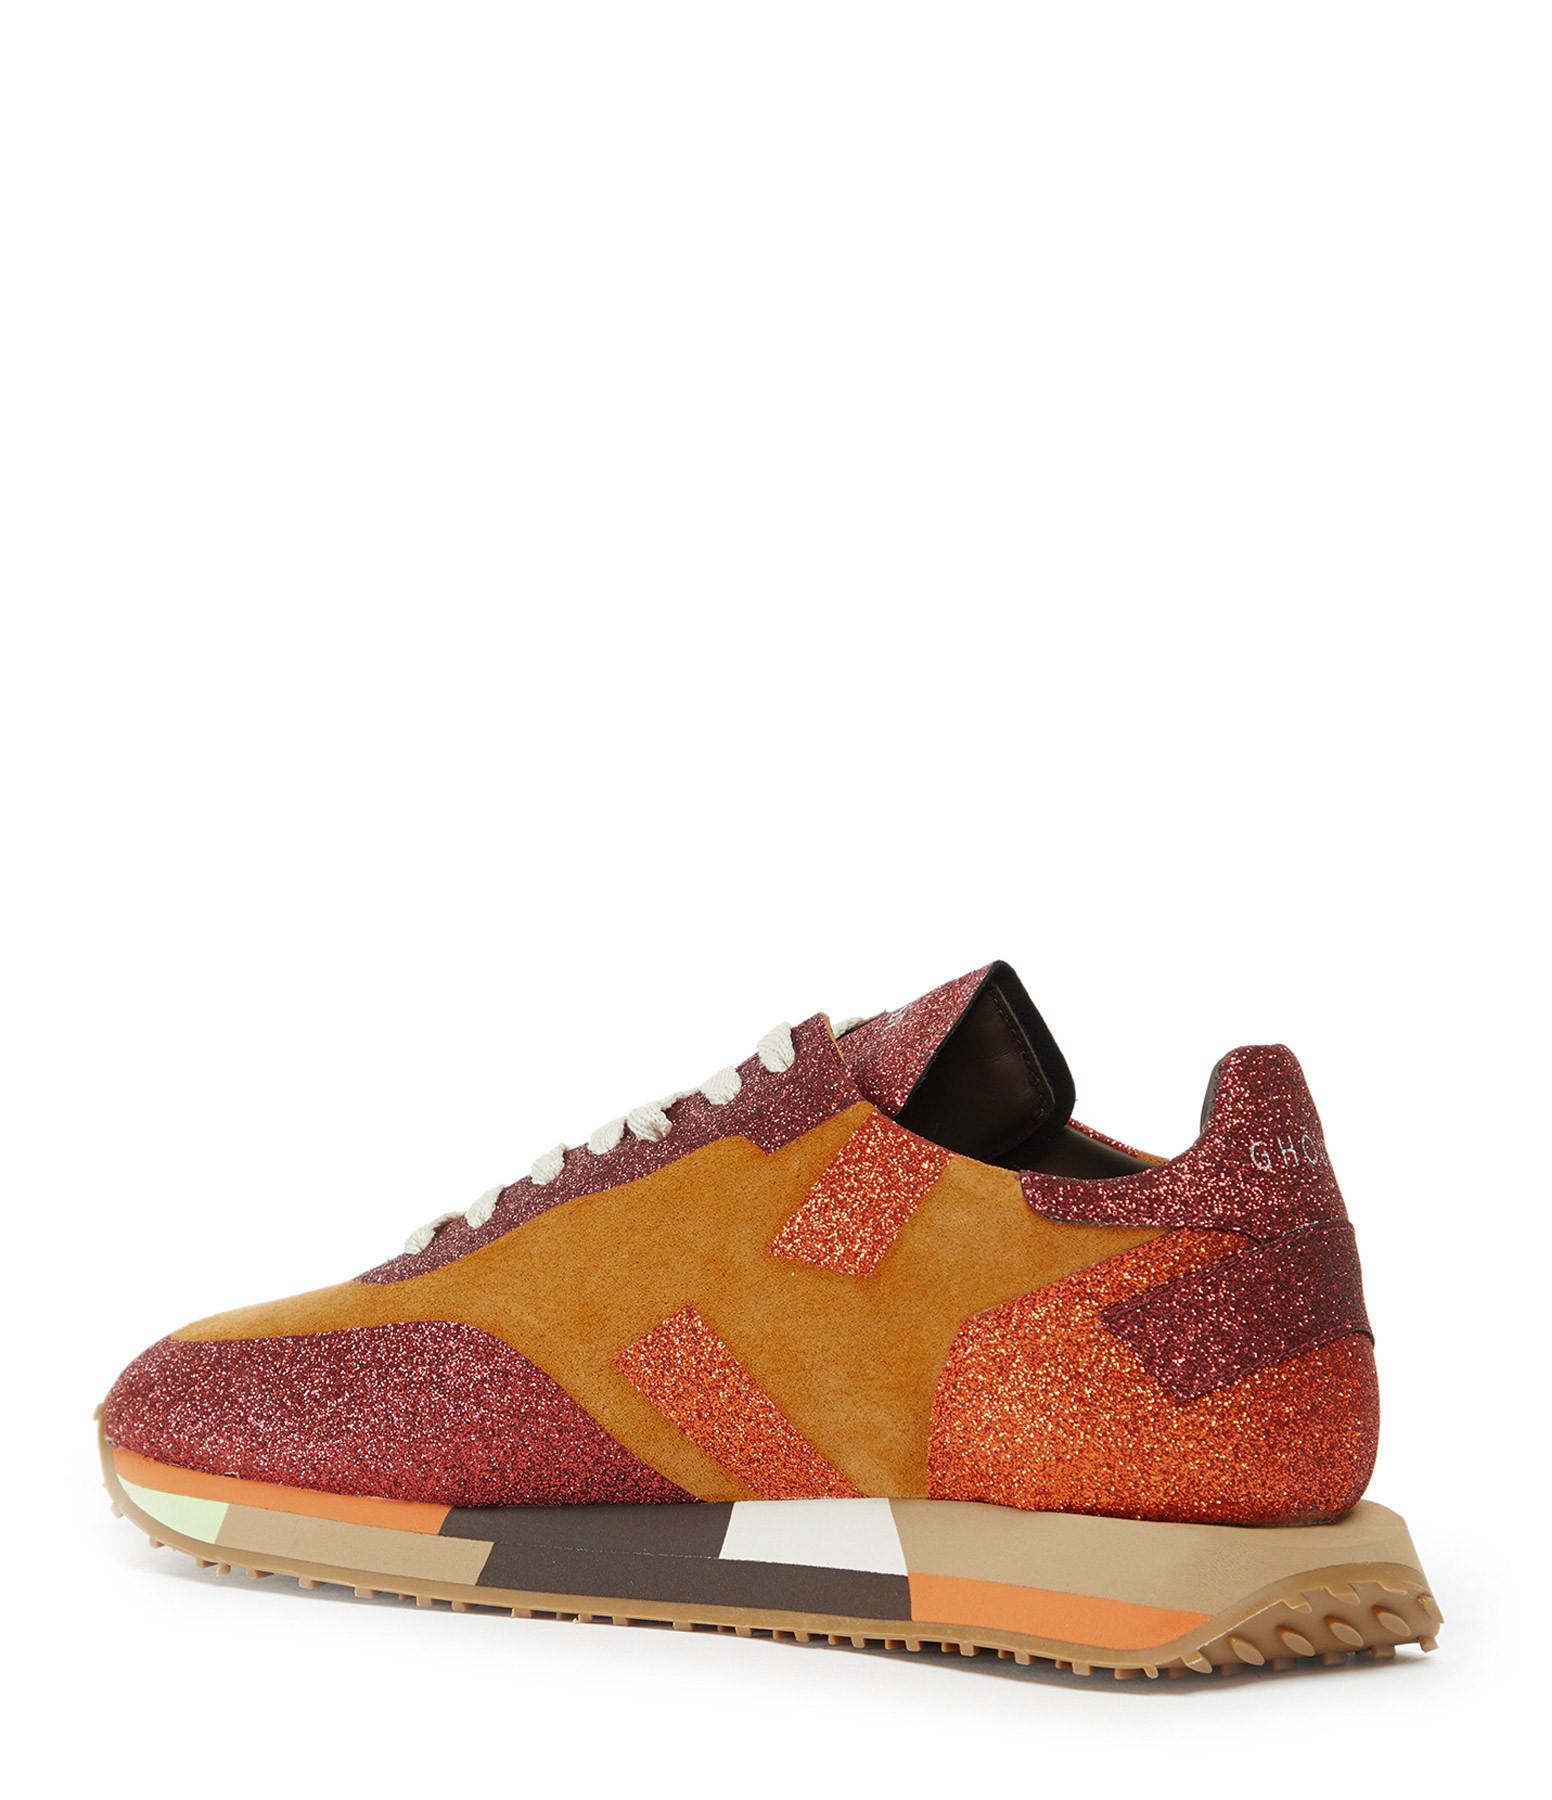 GHOUD VENICE - Baskets Running Star Suédé Glitter Orange